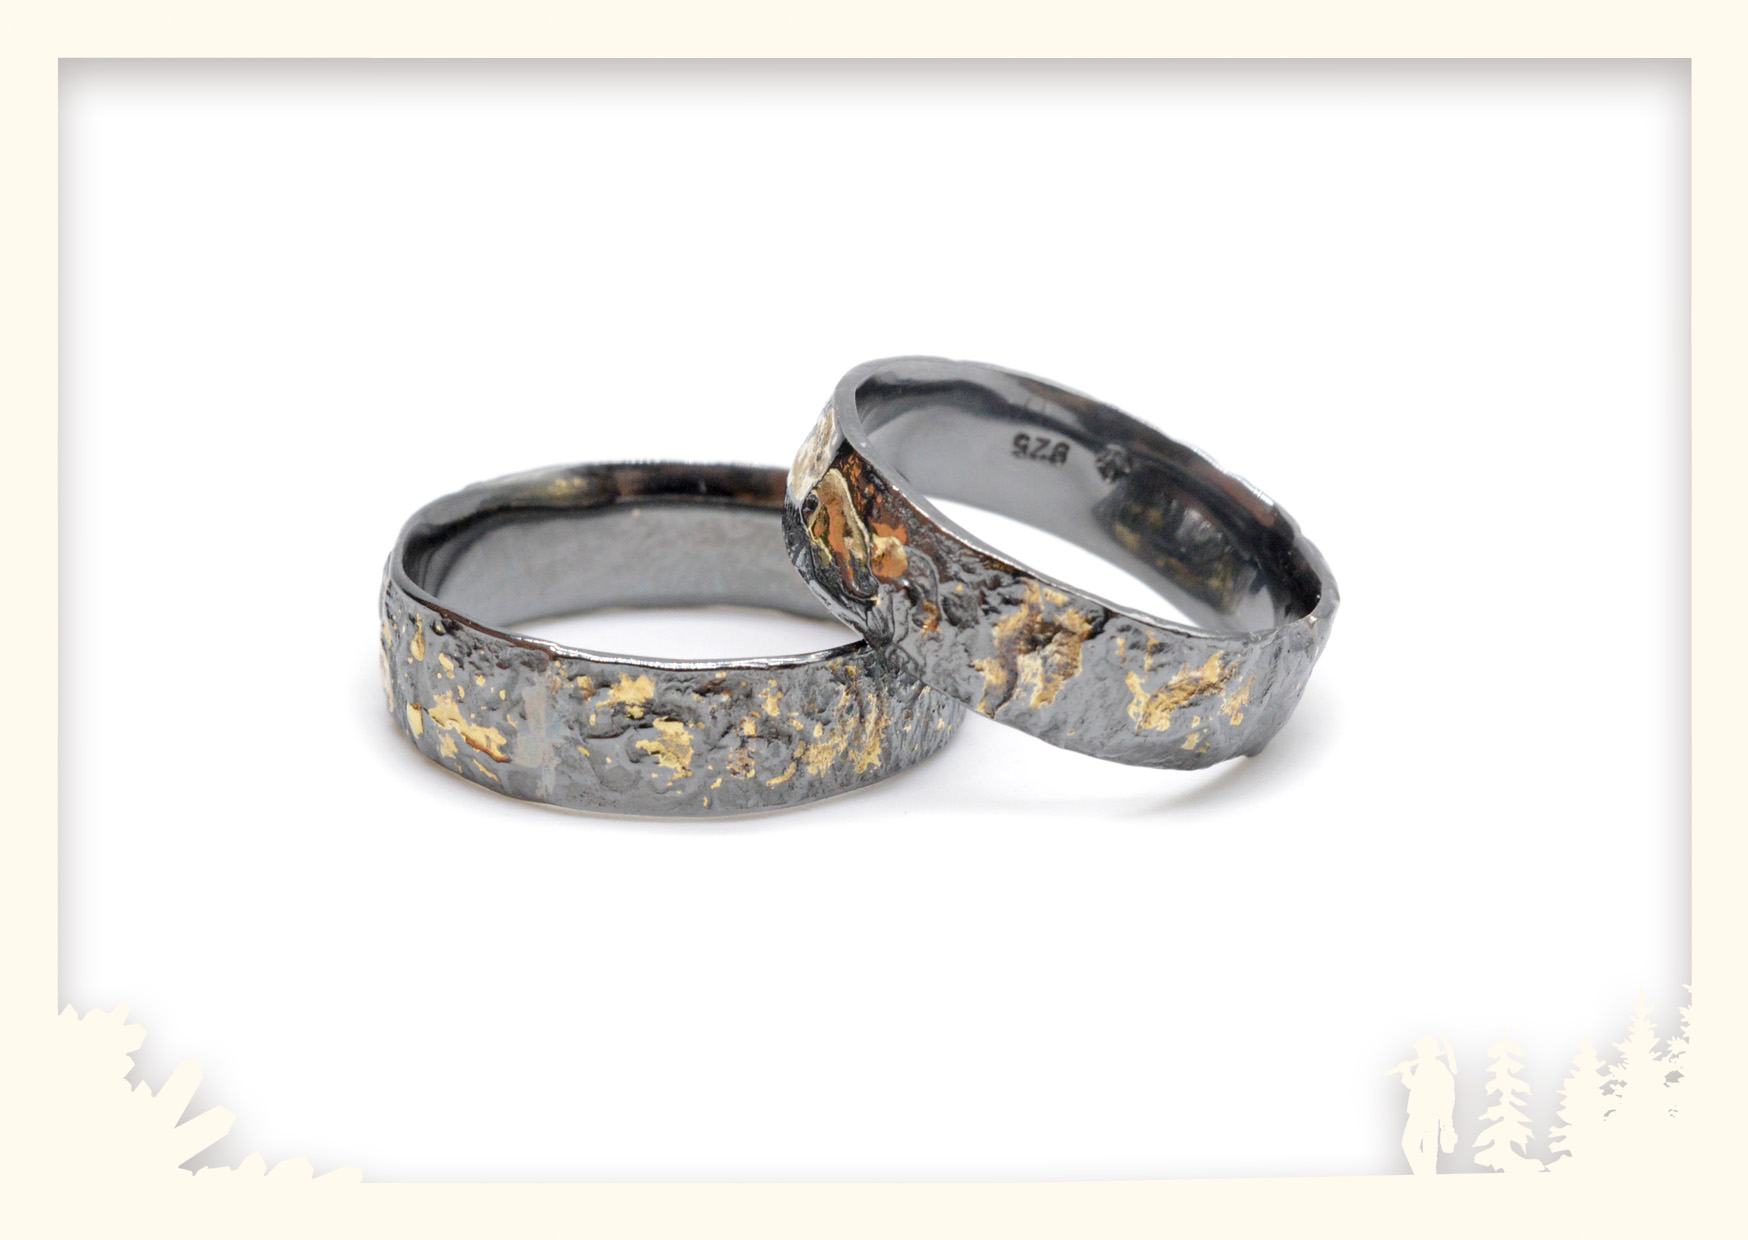 Ringe retikuliert Image